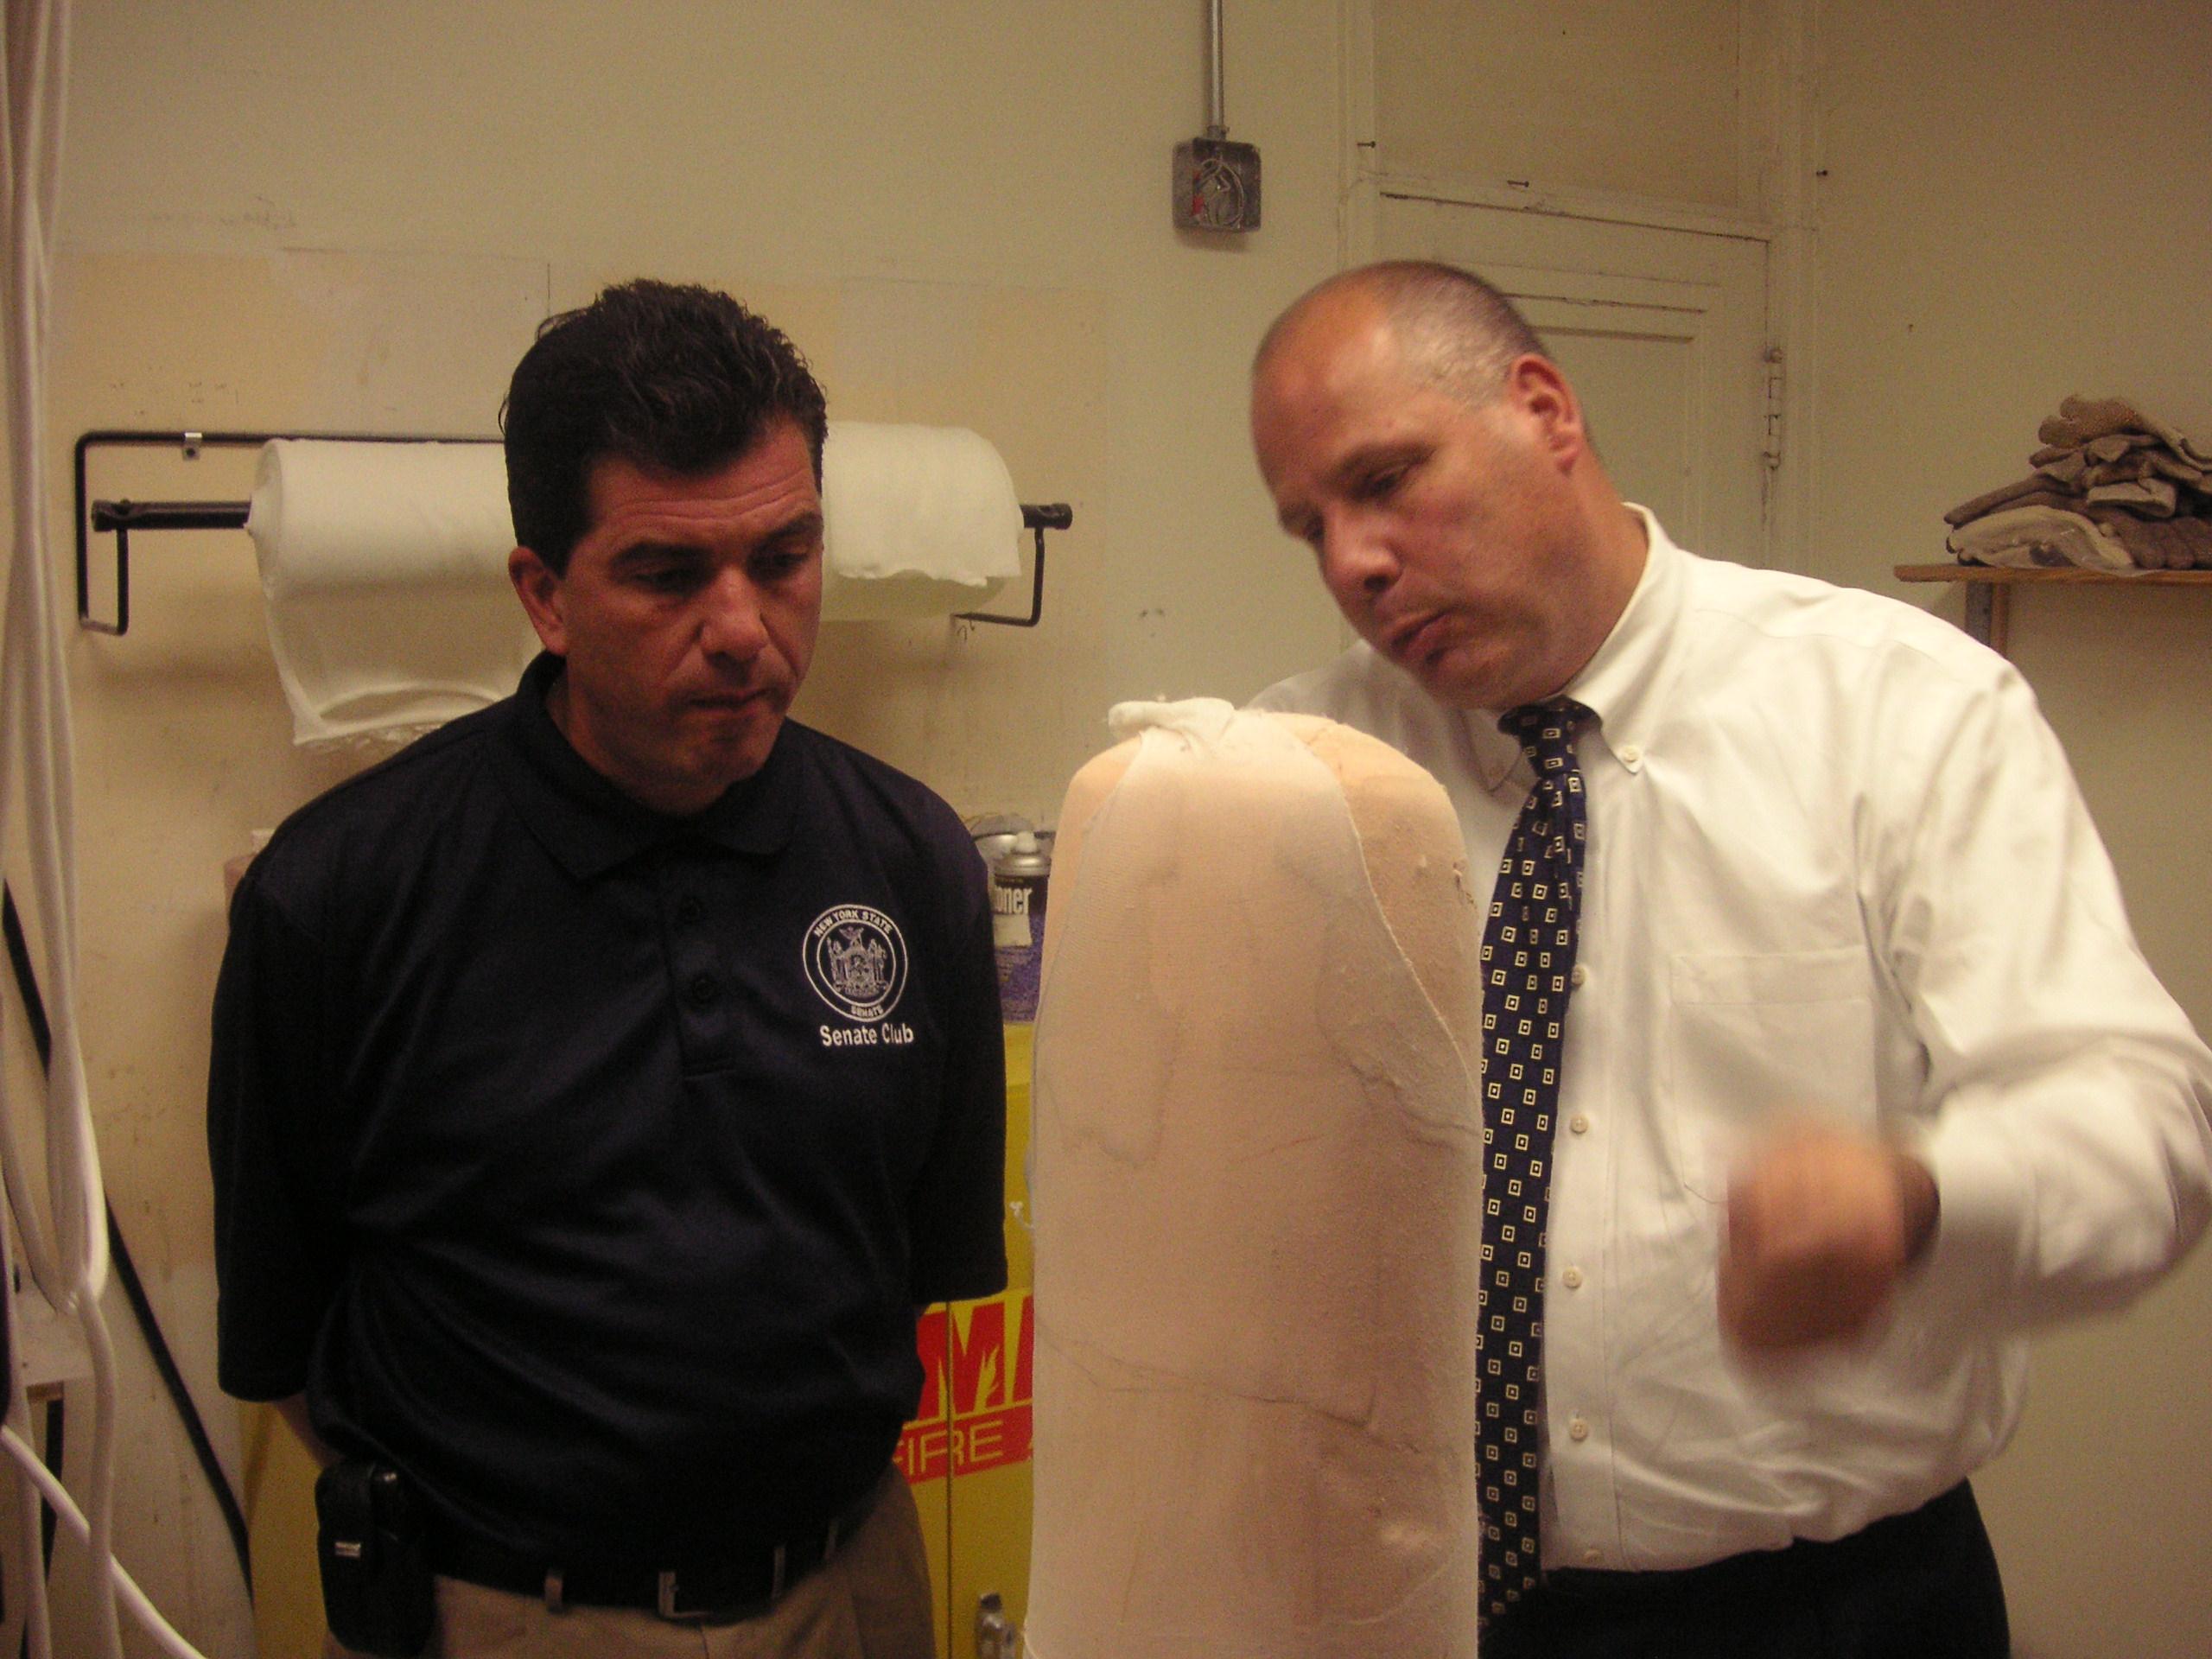 New York Senator Mark Grisanti and East Coast O & P CEO Vincent A. Benenati, CO